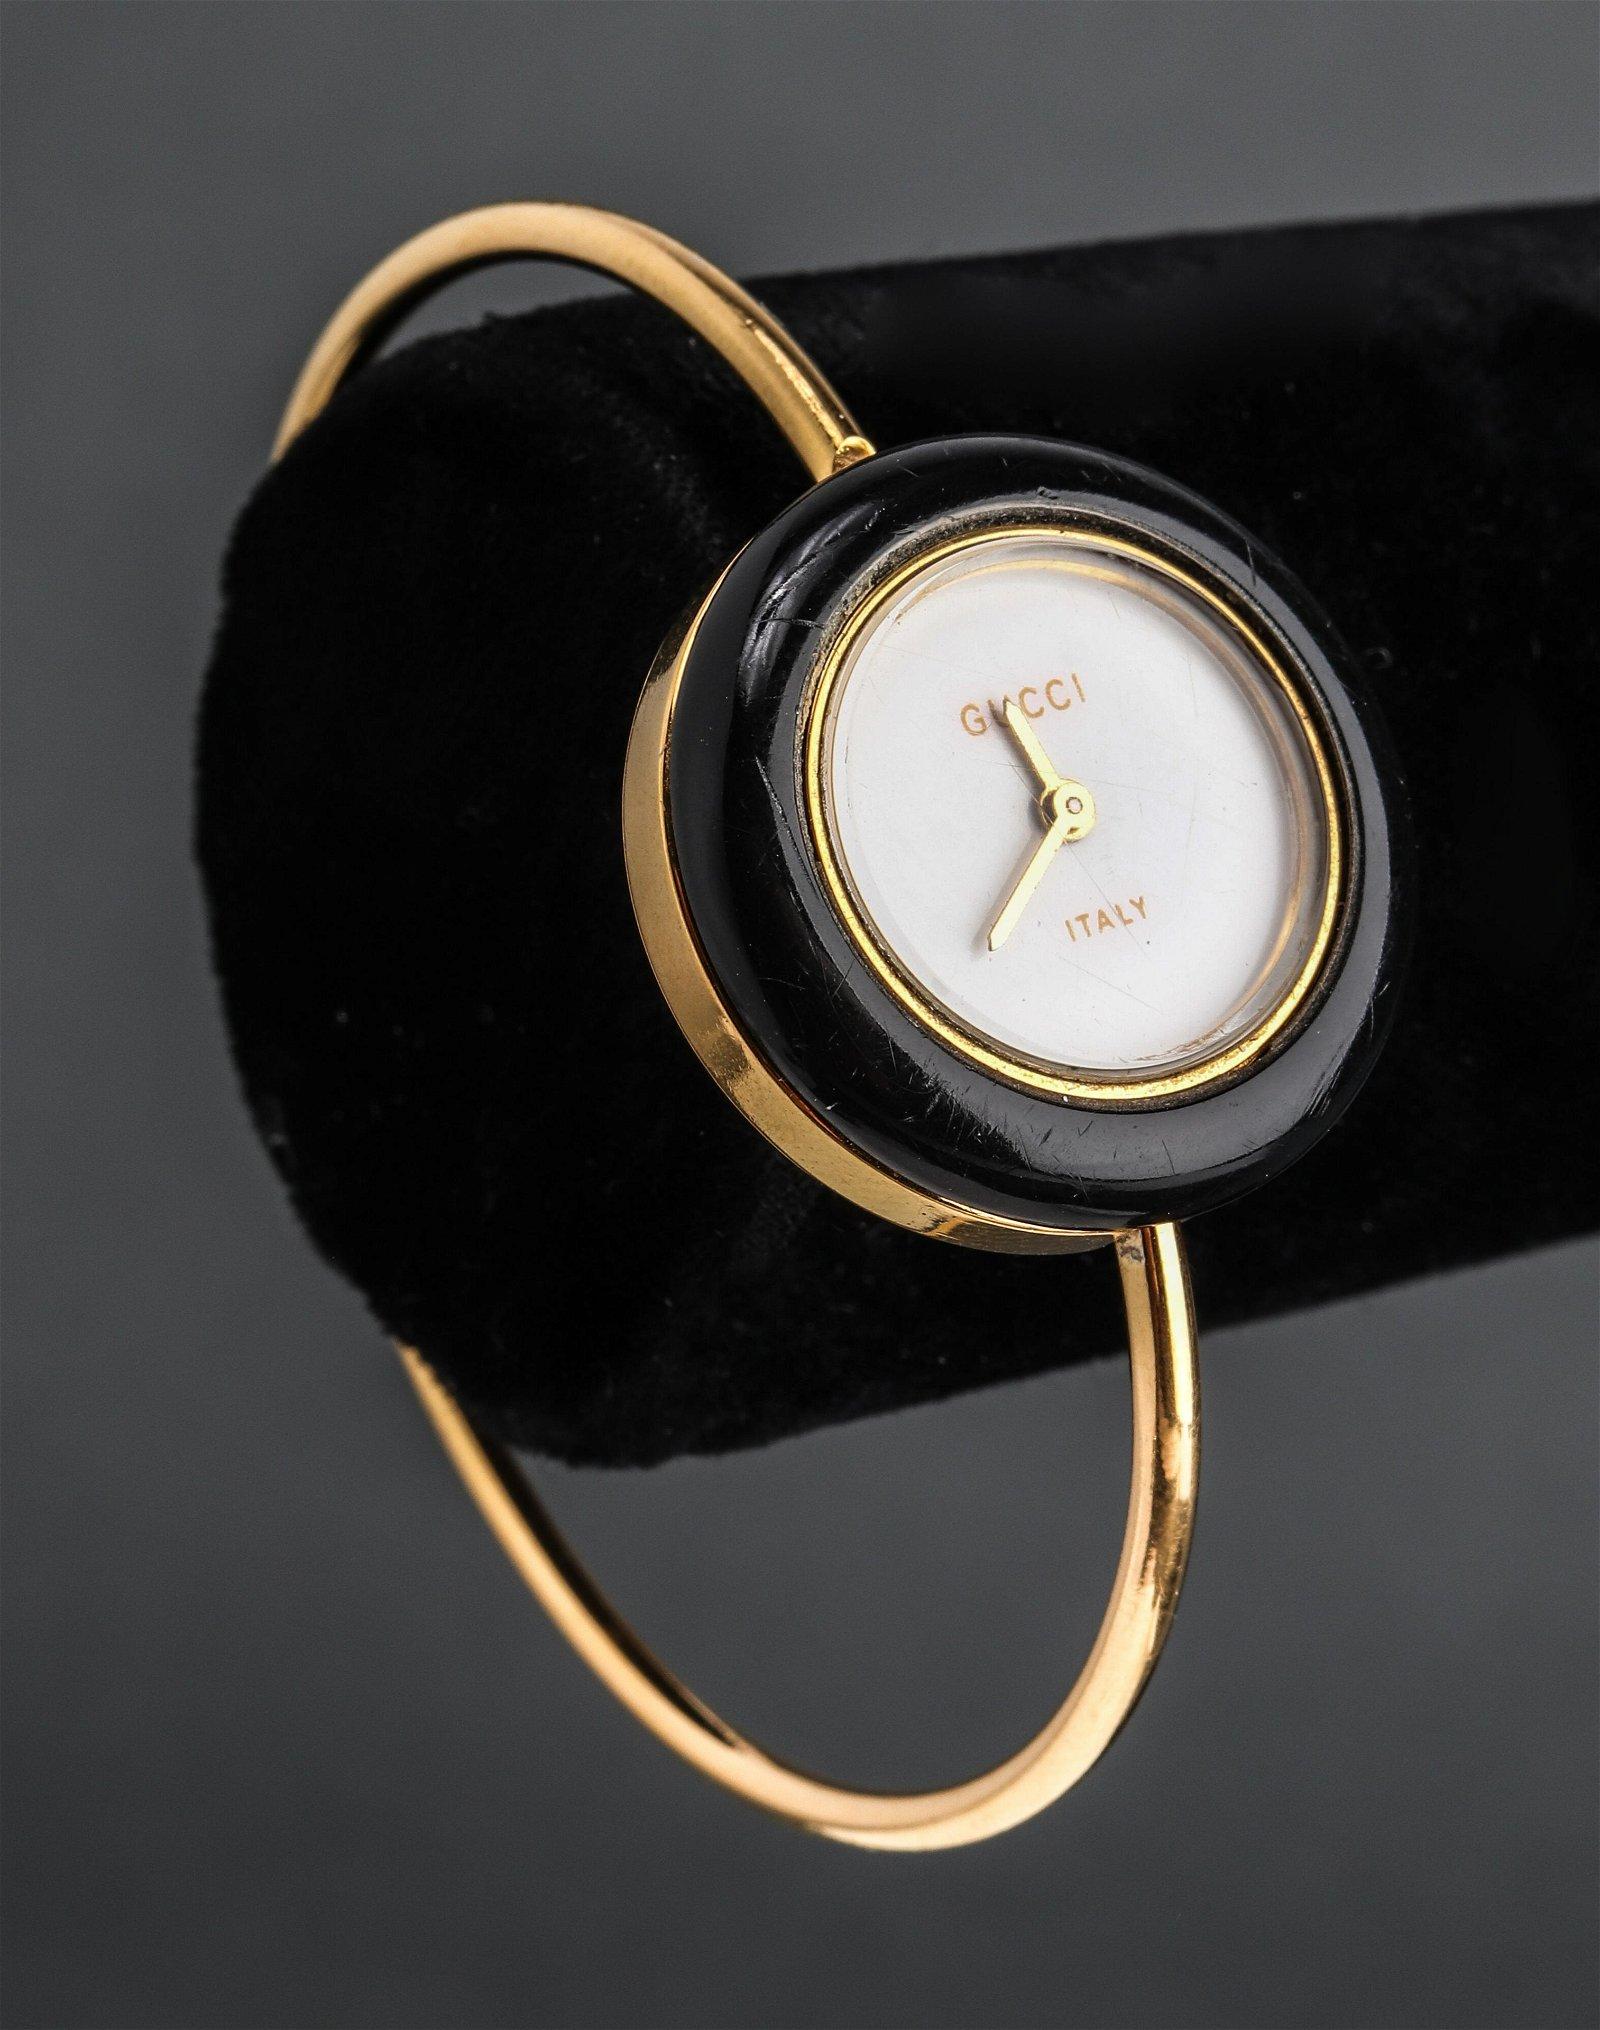 Vintage 1980s Gucci Bangle Wrist Watch